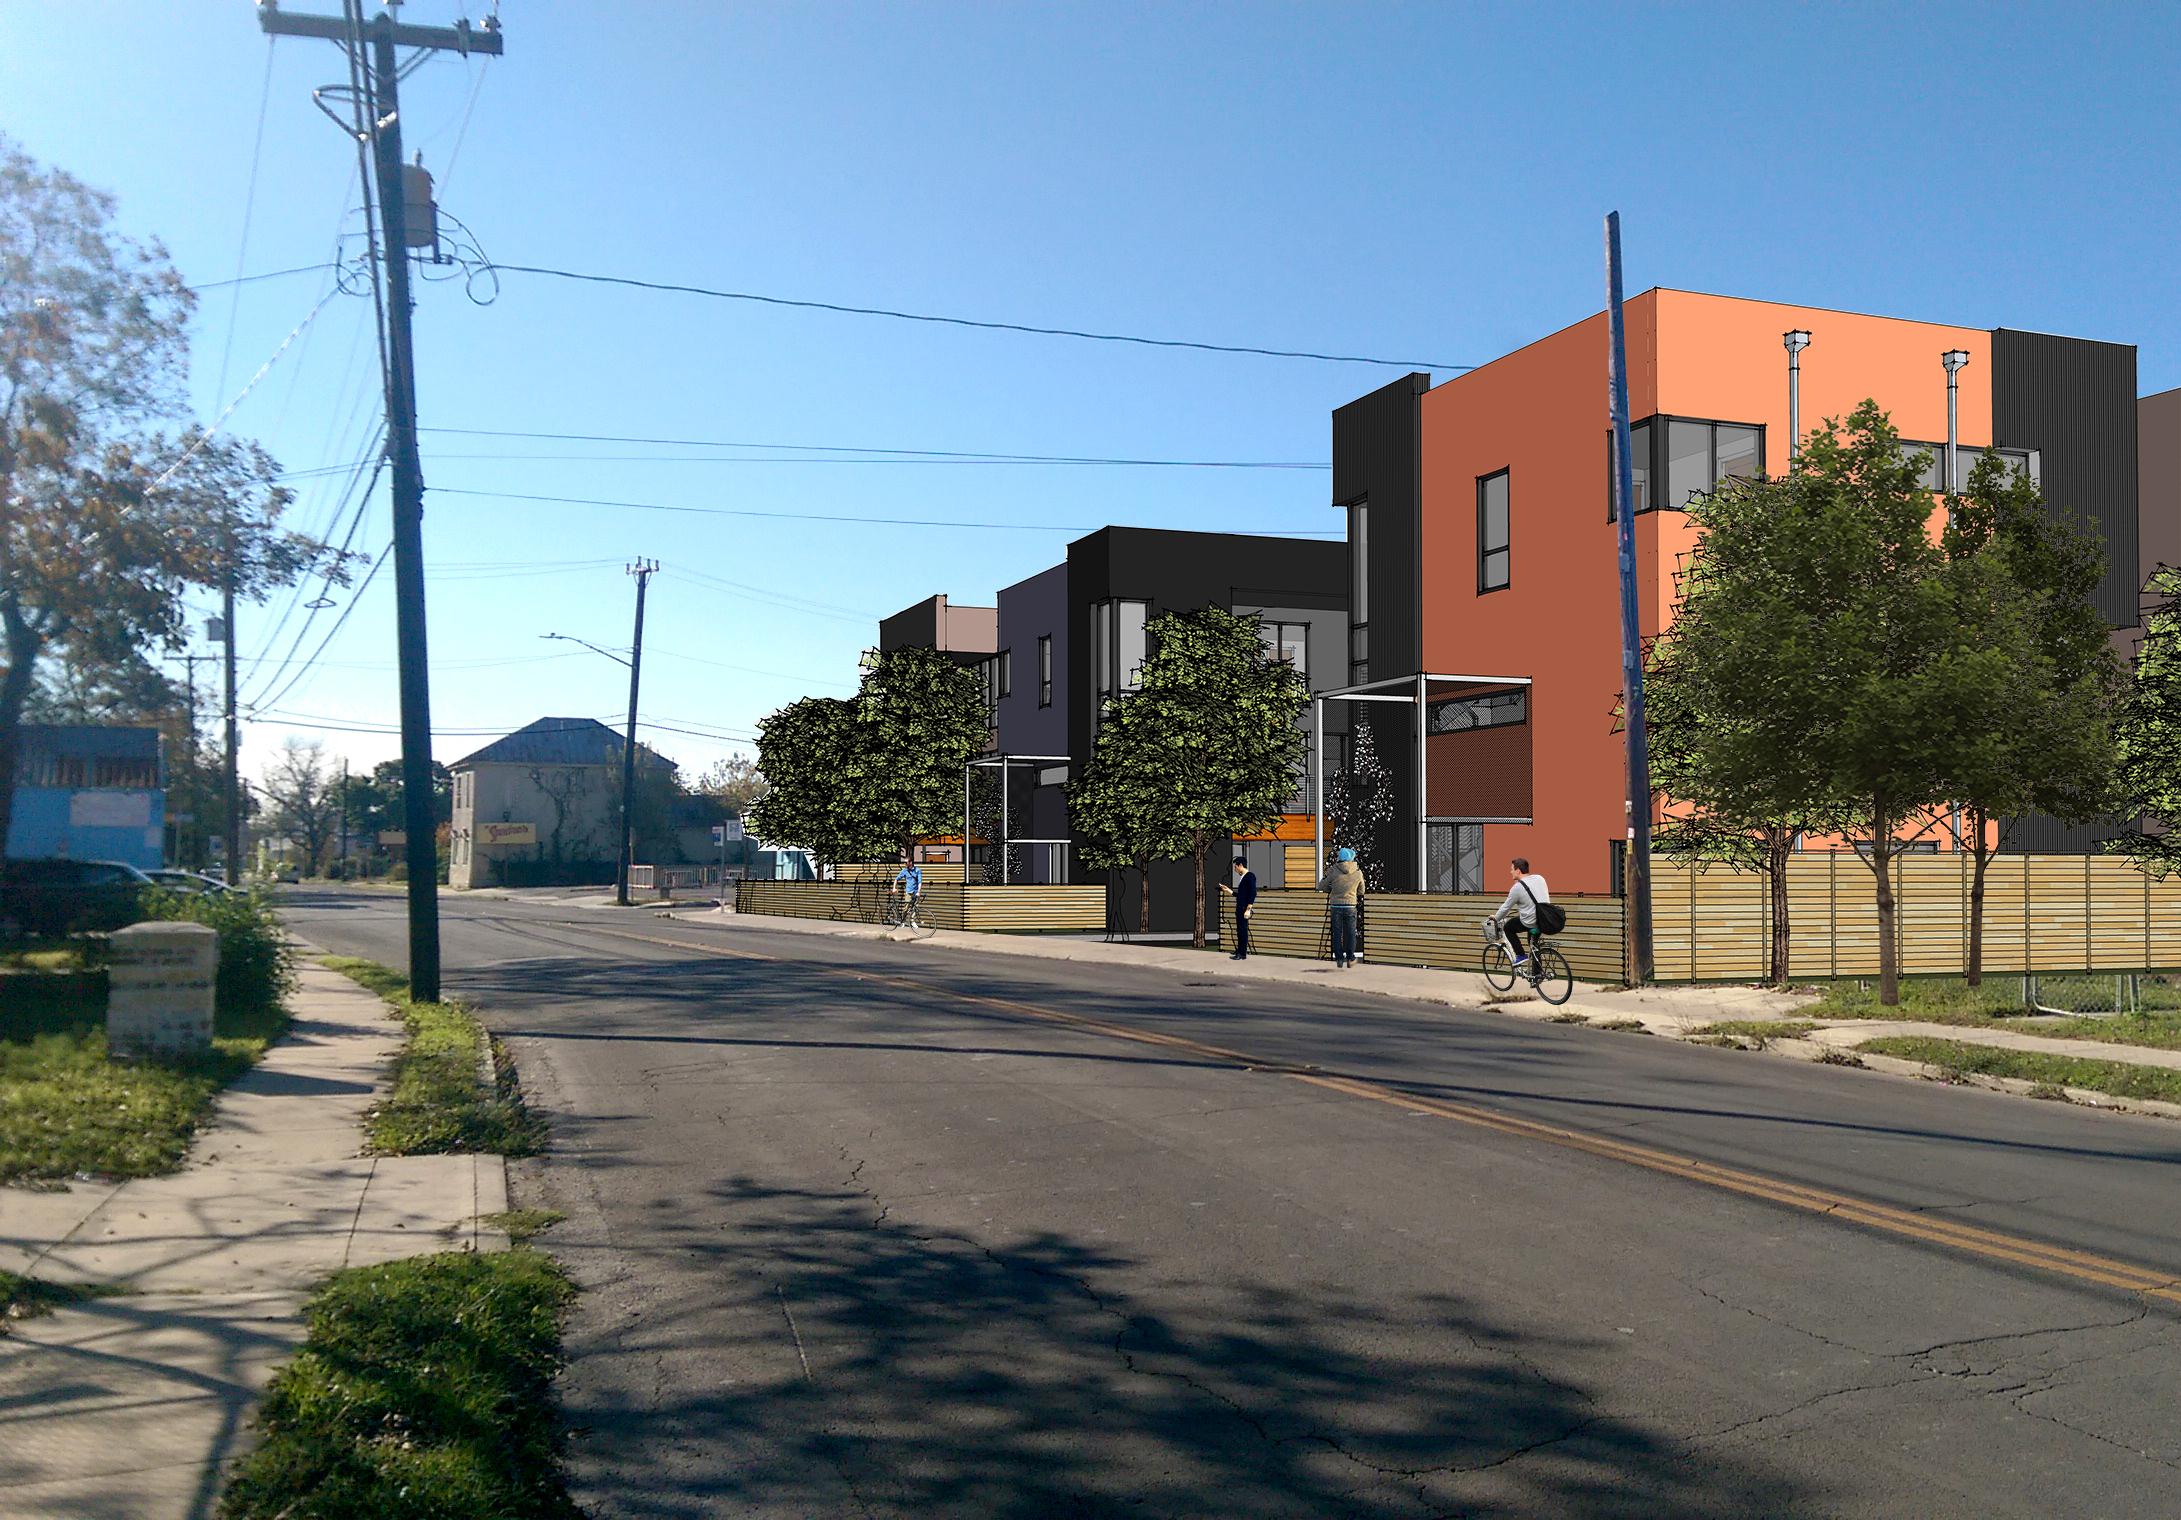 Sunglo - Street Perspective.jpg